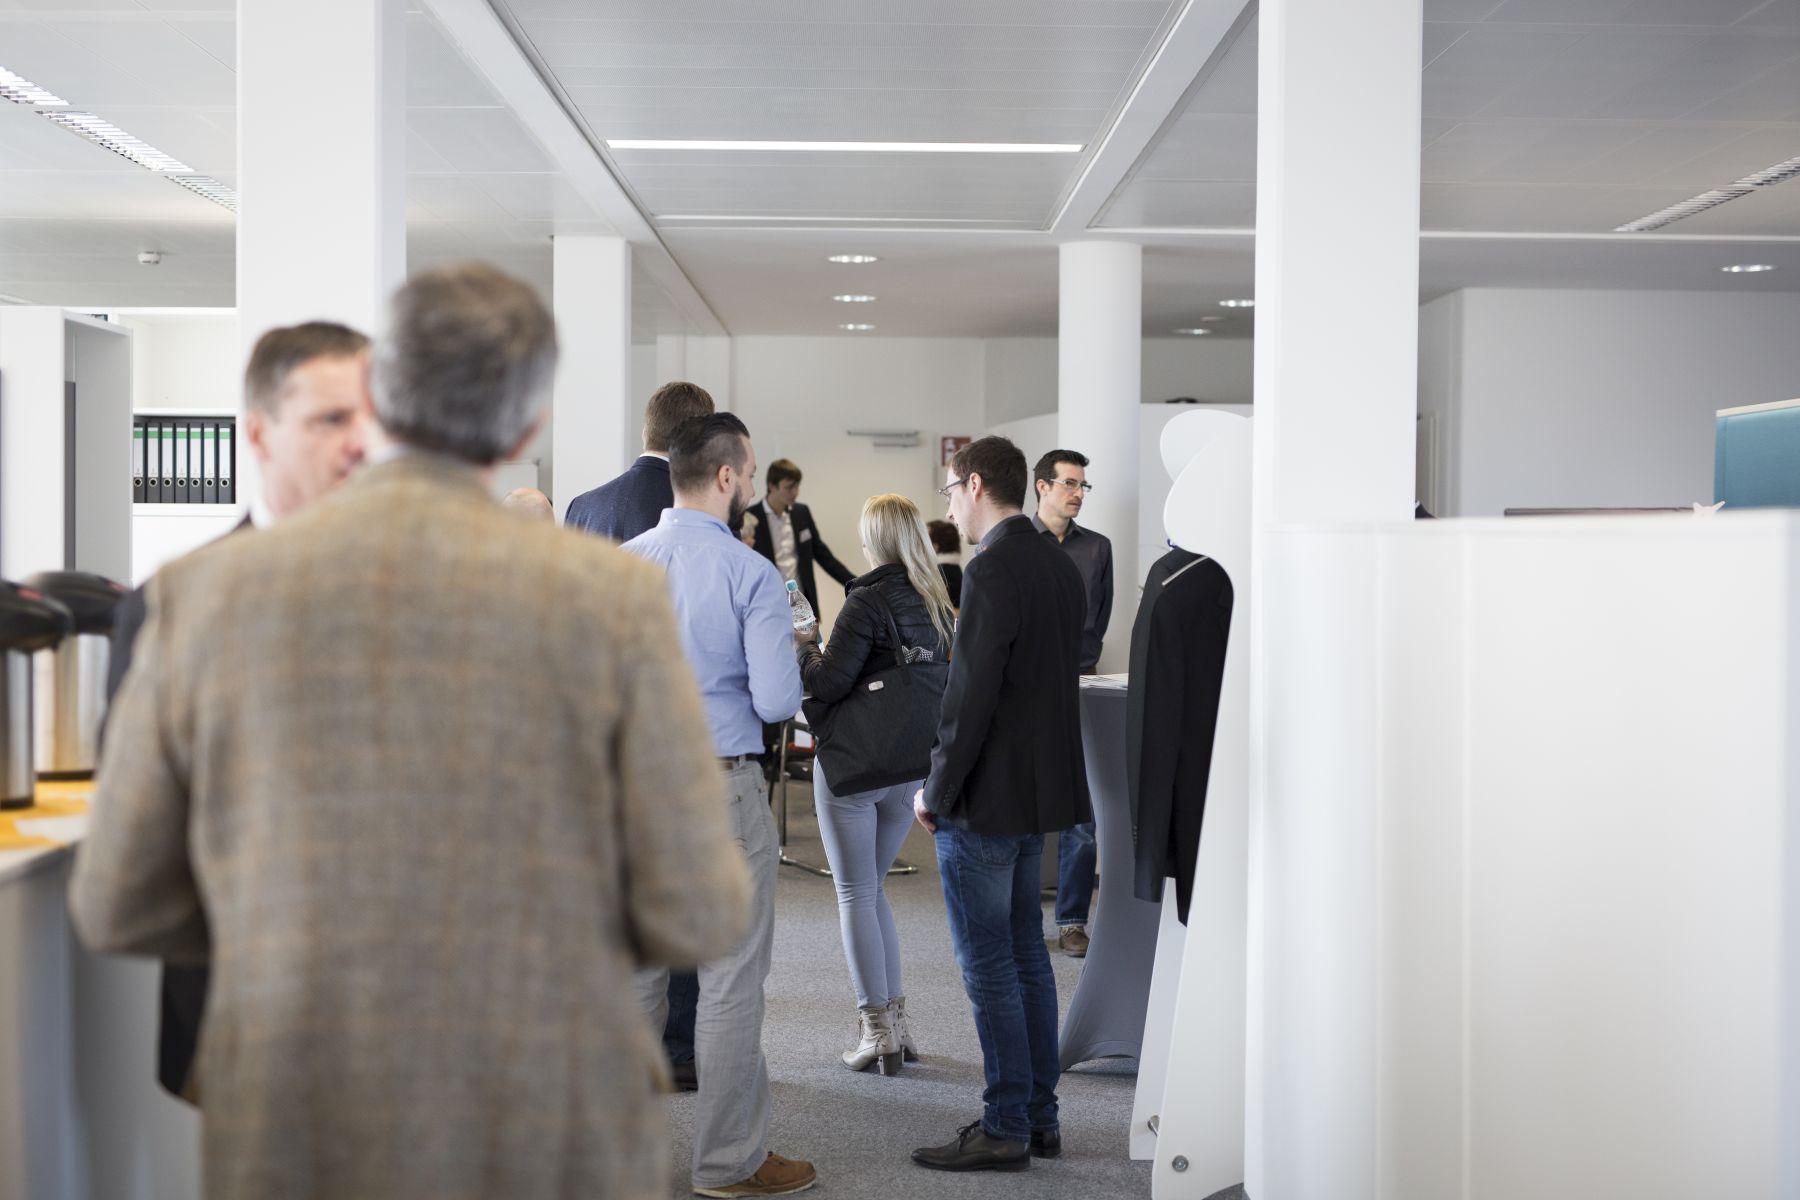 Rückblick: Ergonomie in 5 Punkten - Infoveranstaltung bei Büromöbel-Experte 5